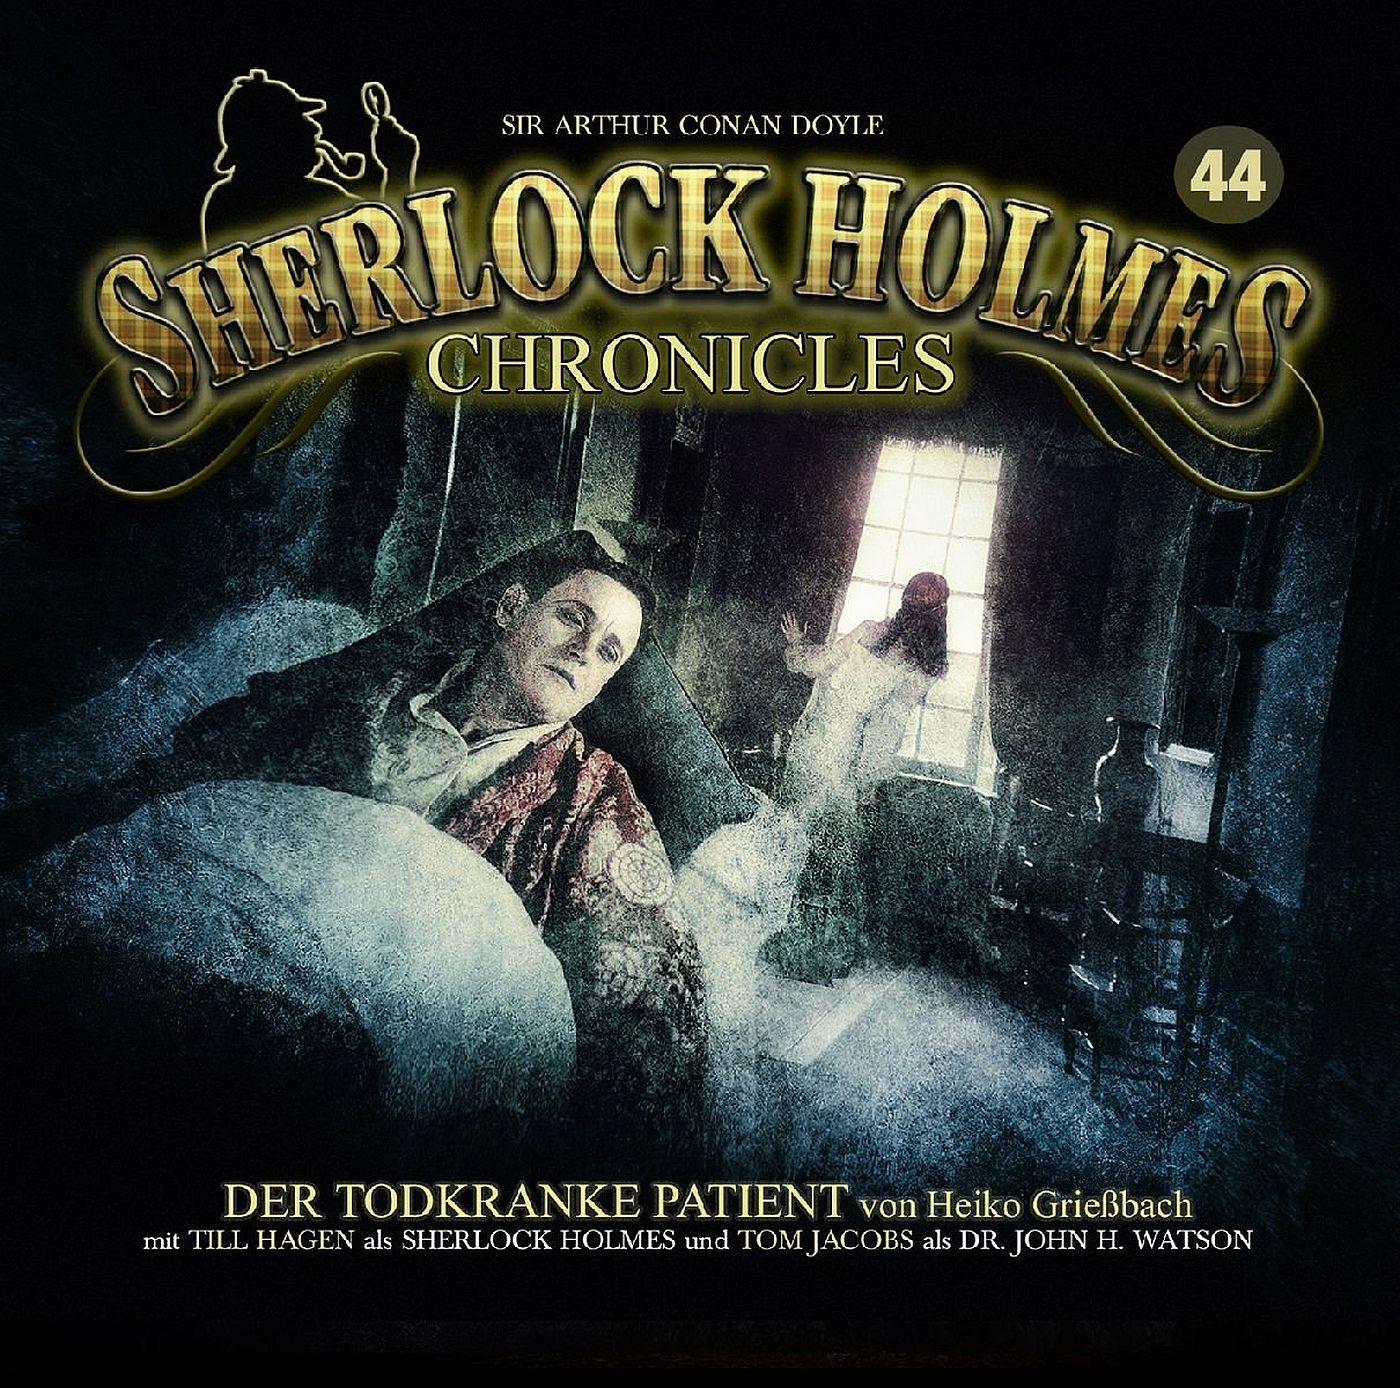 Sherlock Holmes Chronicles 44 Der todkranke Patient